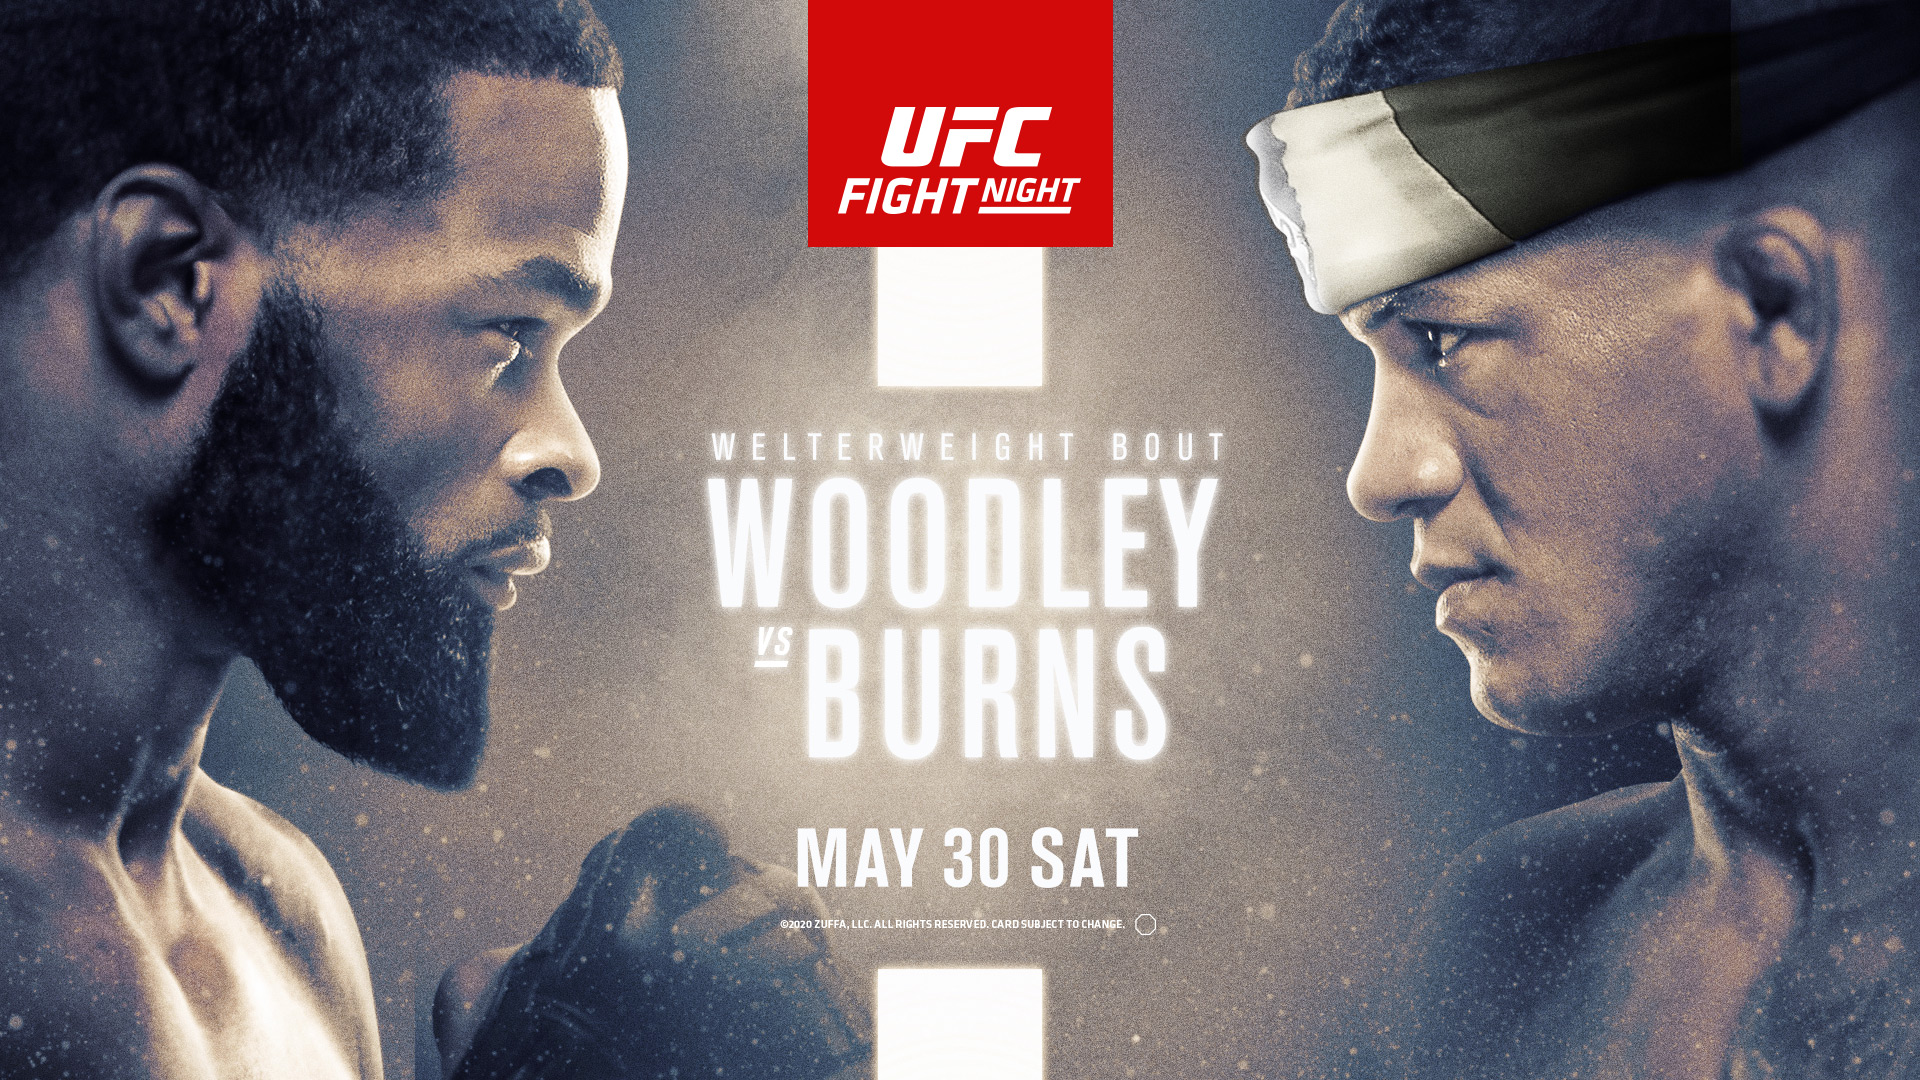 UFC Fight Night: Woodley vs. Burns -